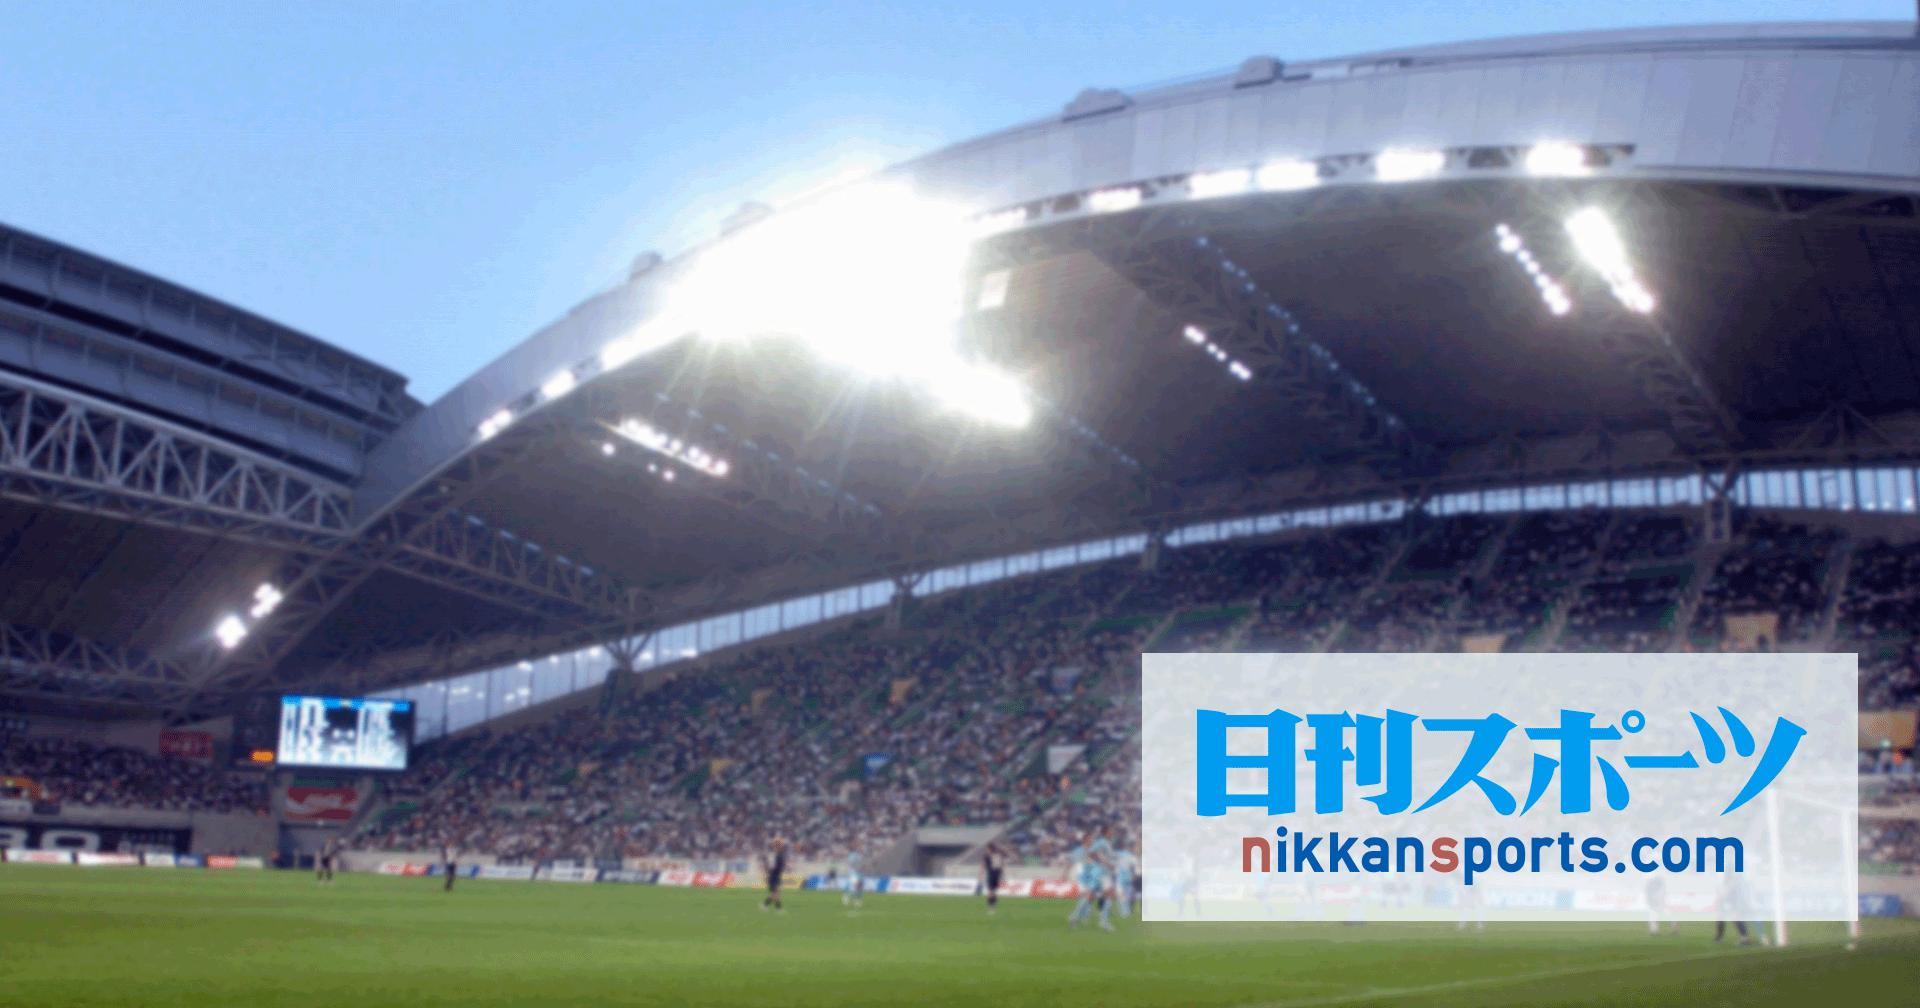 第5回大相撲総選挙 - 大相撲 : 日刊スポーツ